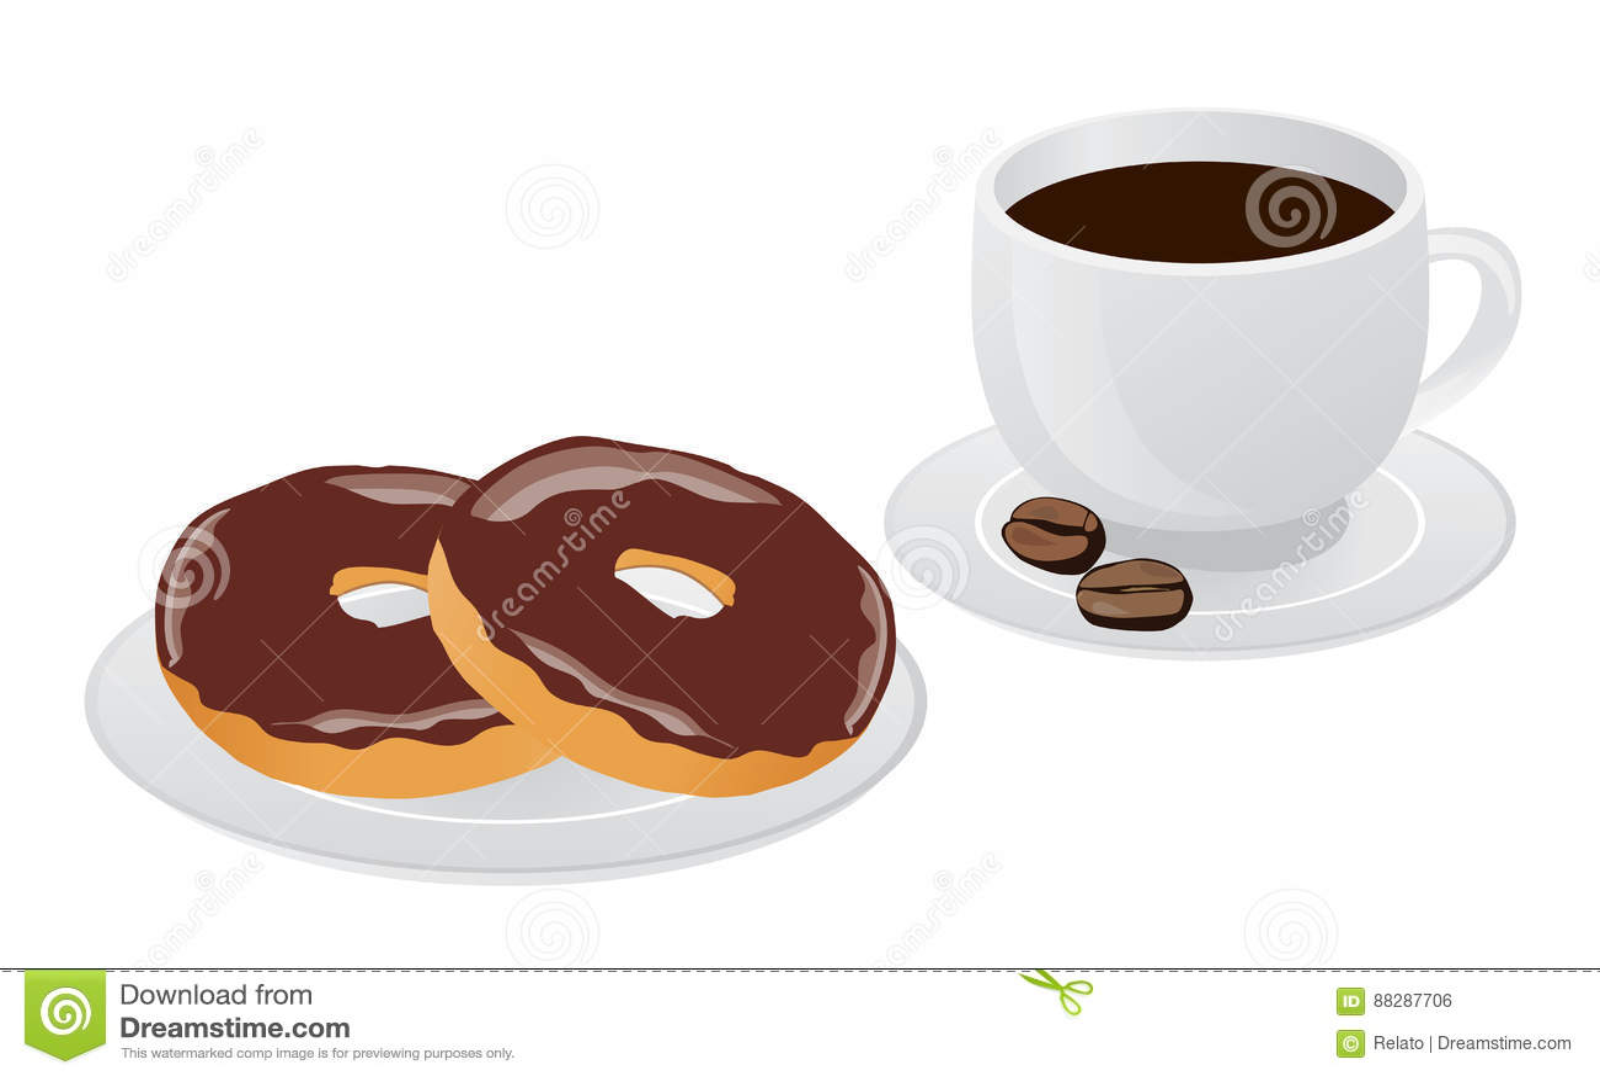 Vector coffee donut